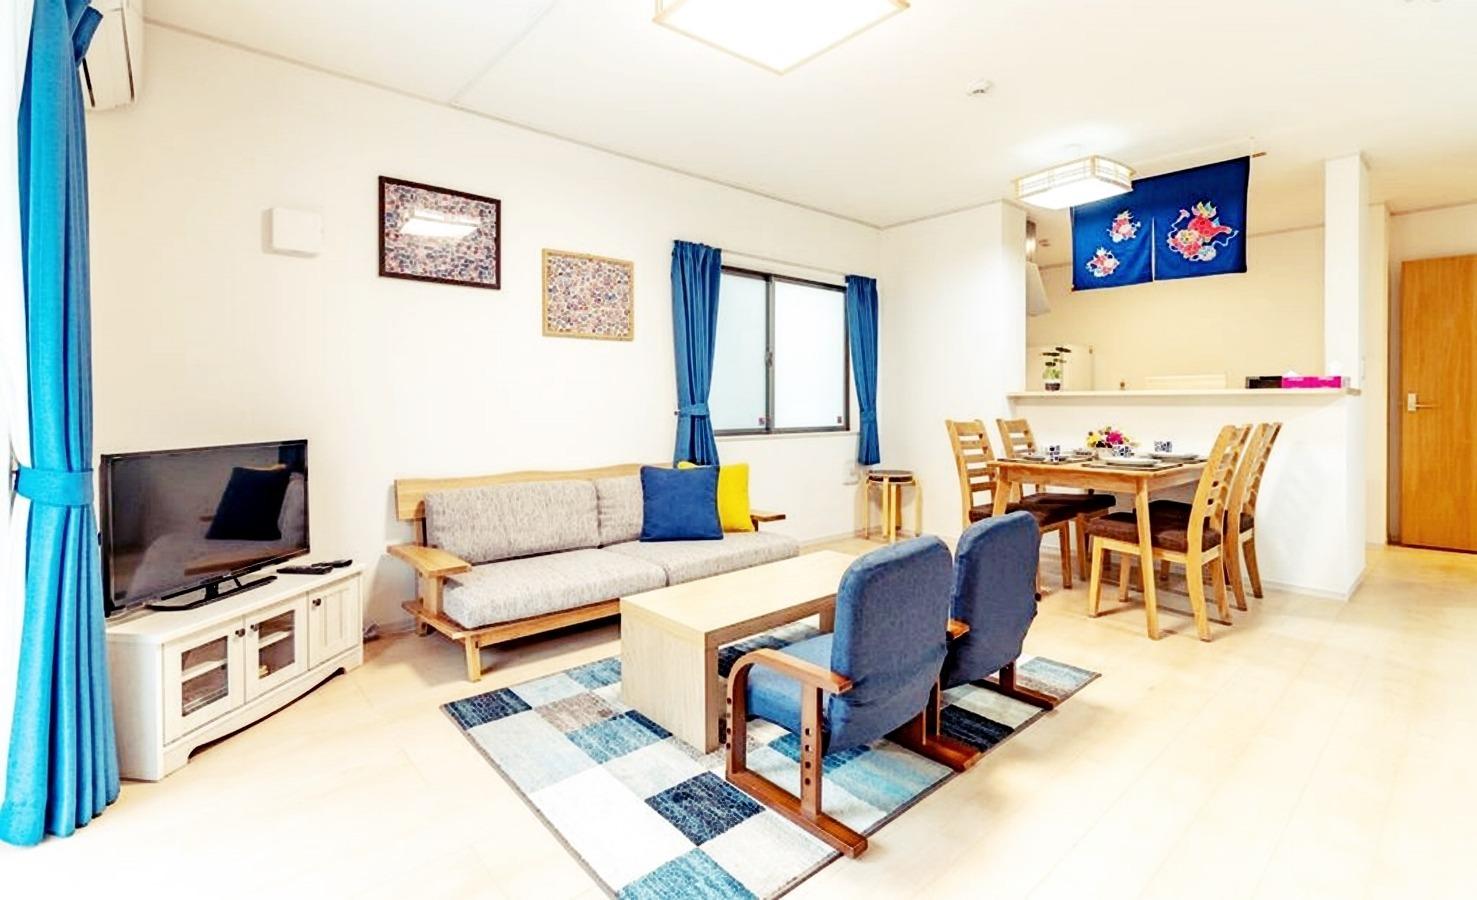 Cozy House B 合法民泊-2-3家族に最適なスペース/3LDKの貸切宿です